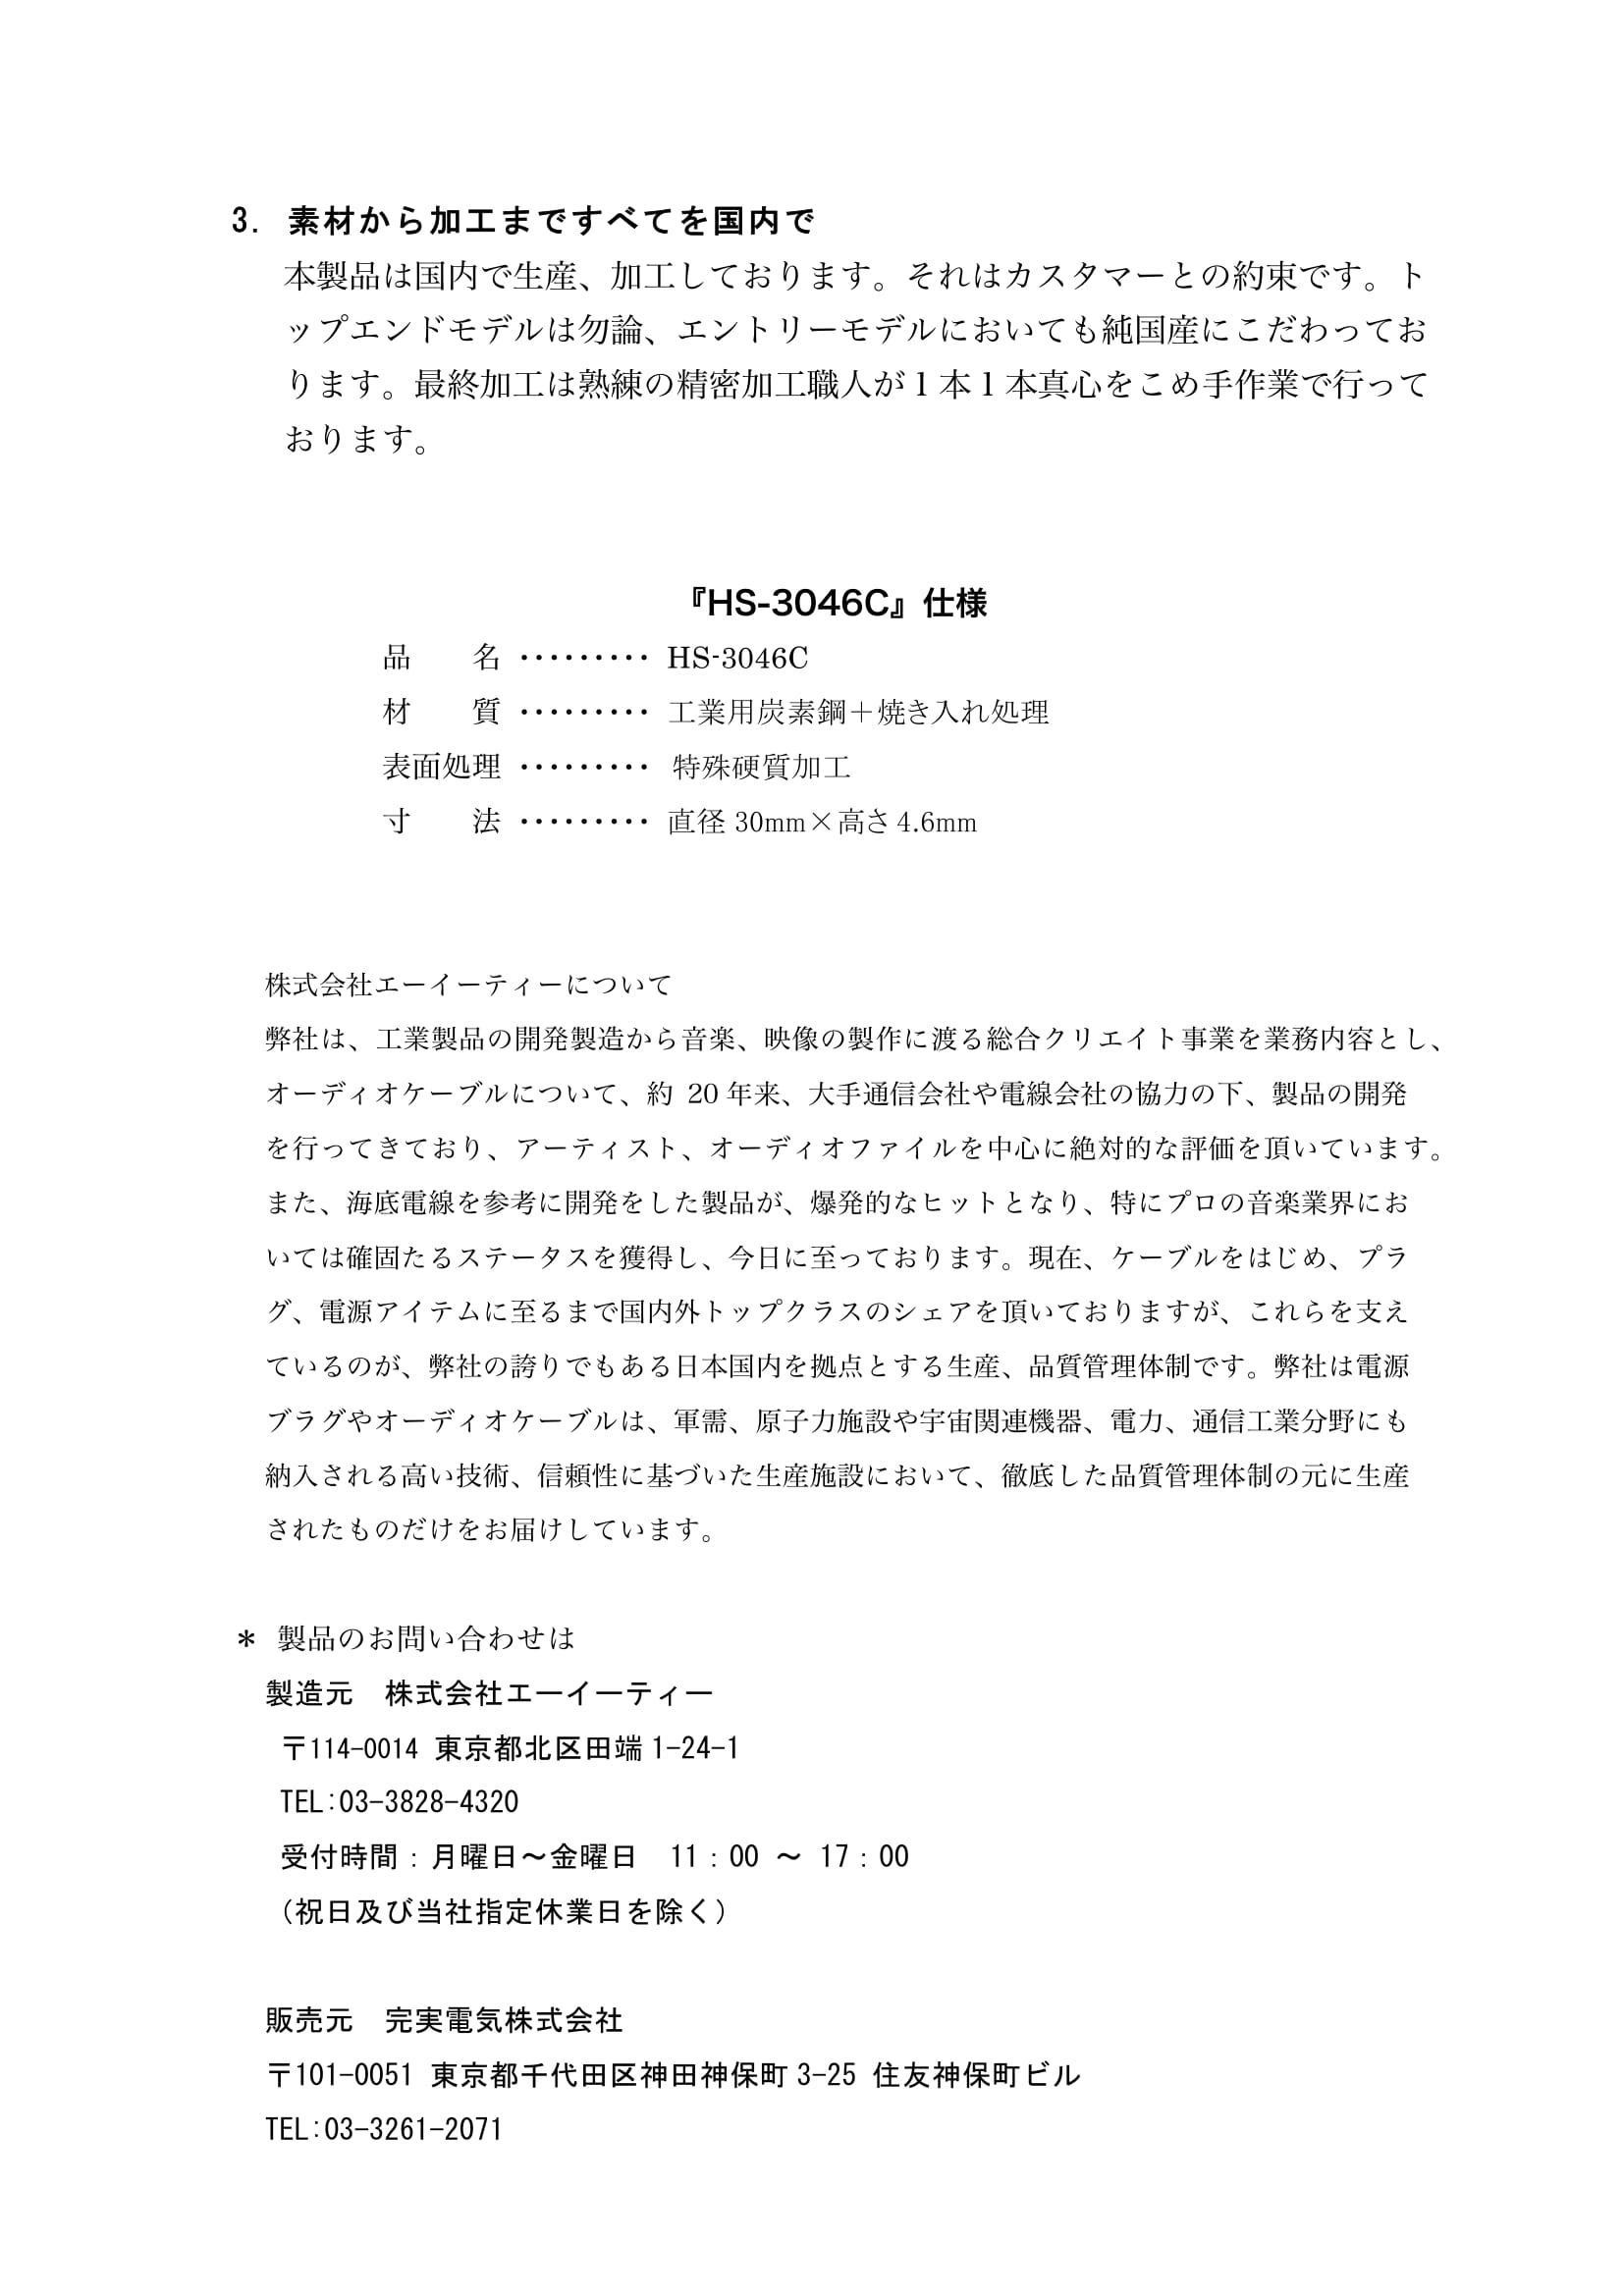 HS-3046Cリリース-3